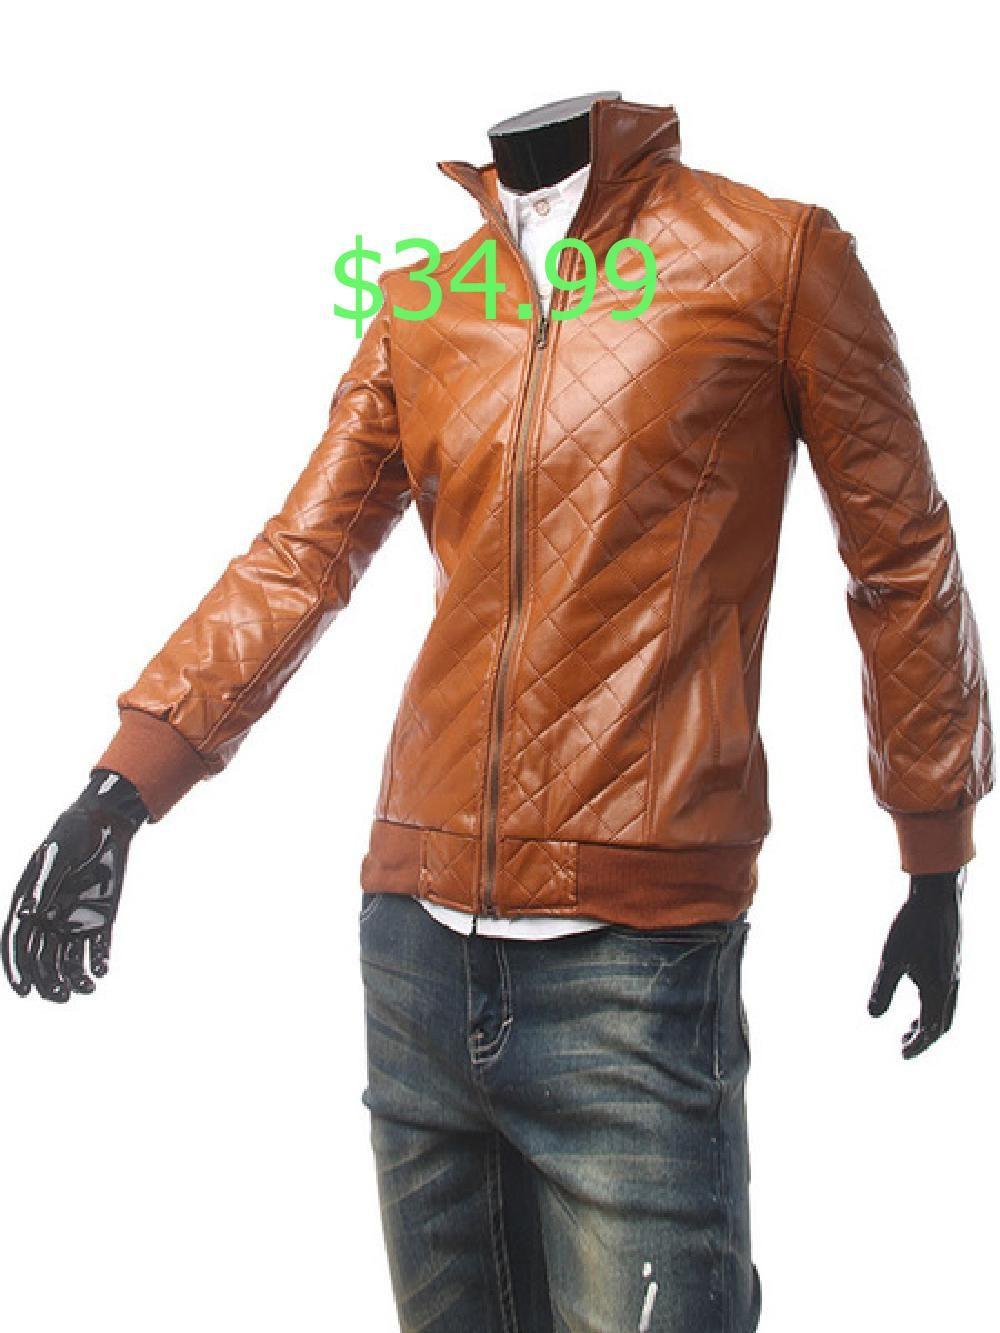 34 99 Color Black Coffee Brown Size L M Xxl Xl Fashiontrends Womensfashiontrend Womensjoyfashion In 2020 Mens Jackets Jackets Leather Jacket